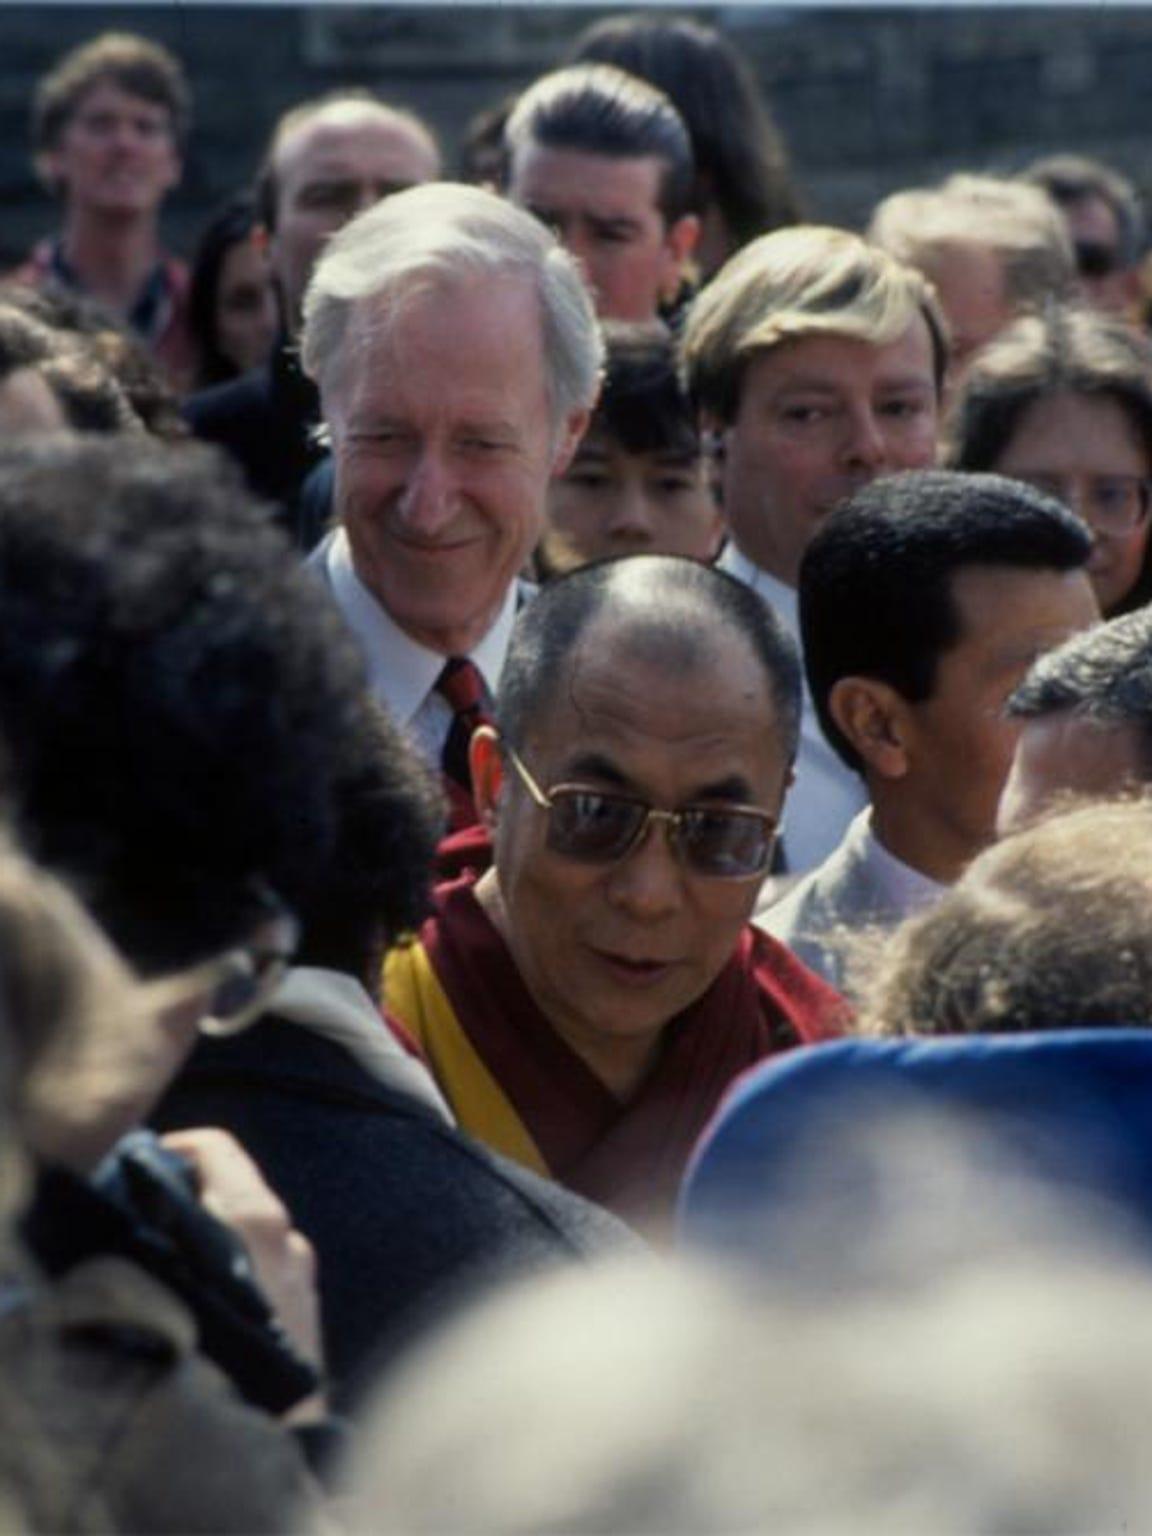 The Dalai Lama visited Cornell in 1991.